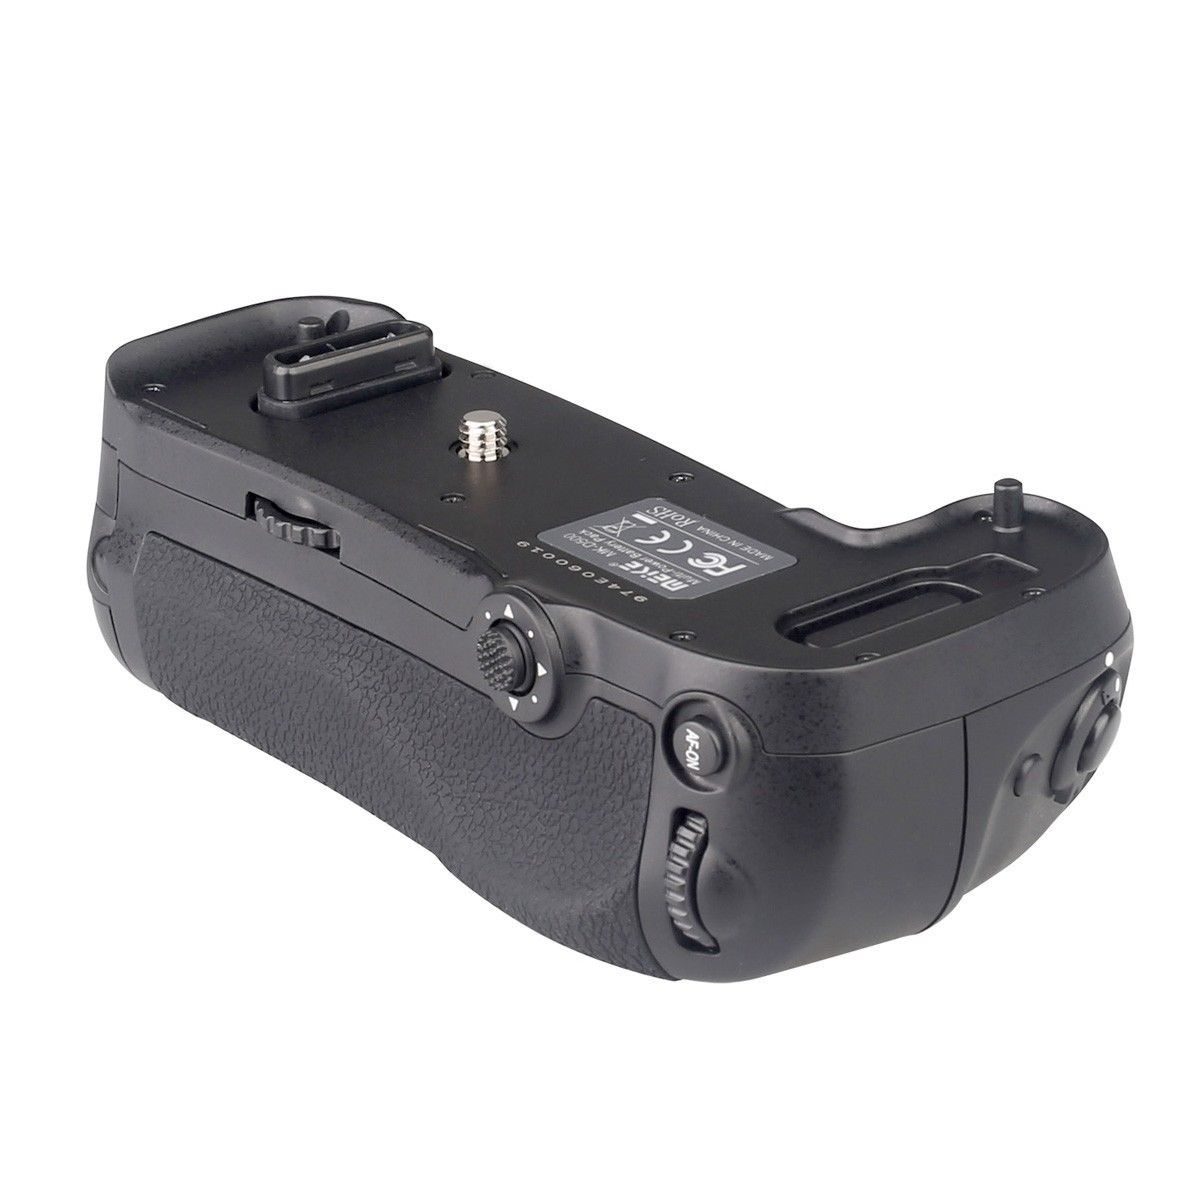 bilder für D17 Vertikale Batteriegriff handpackung halter für Nikon d500 EN-EL15 DSLR kamera MB-D17